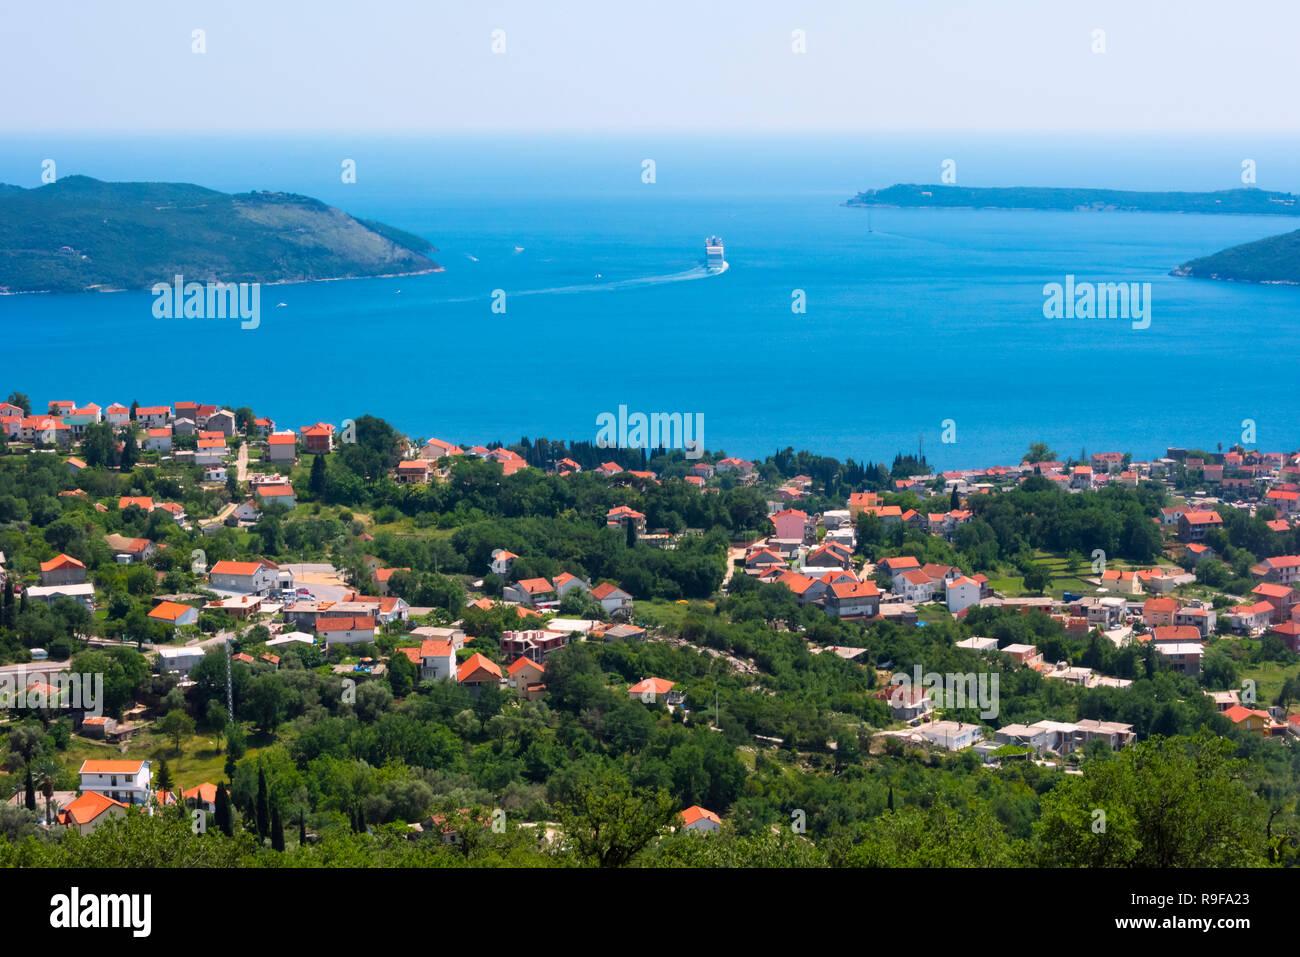 Houses along the Adriatic coast, northwest Montenegro - Stock Image